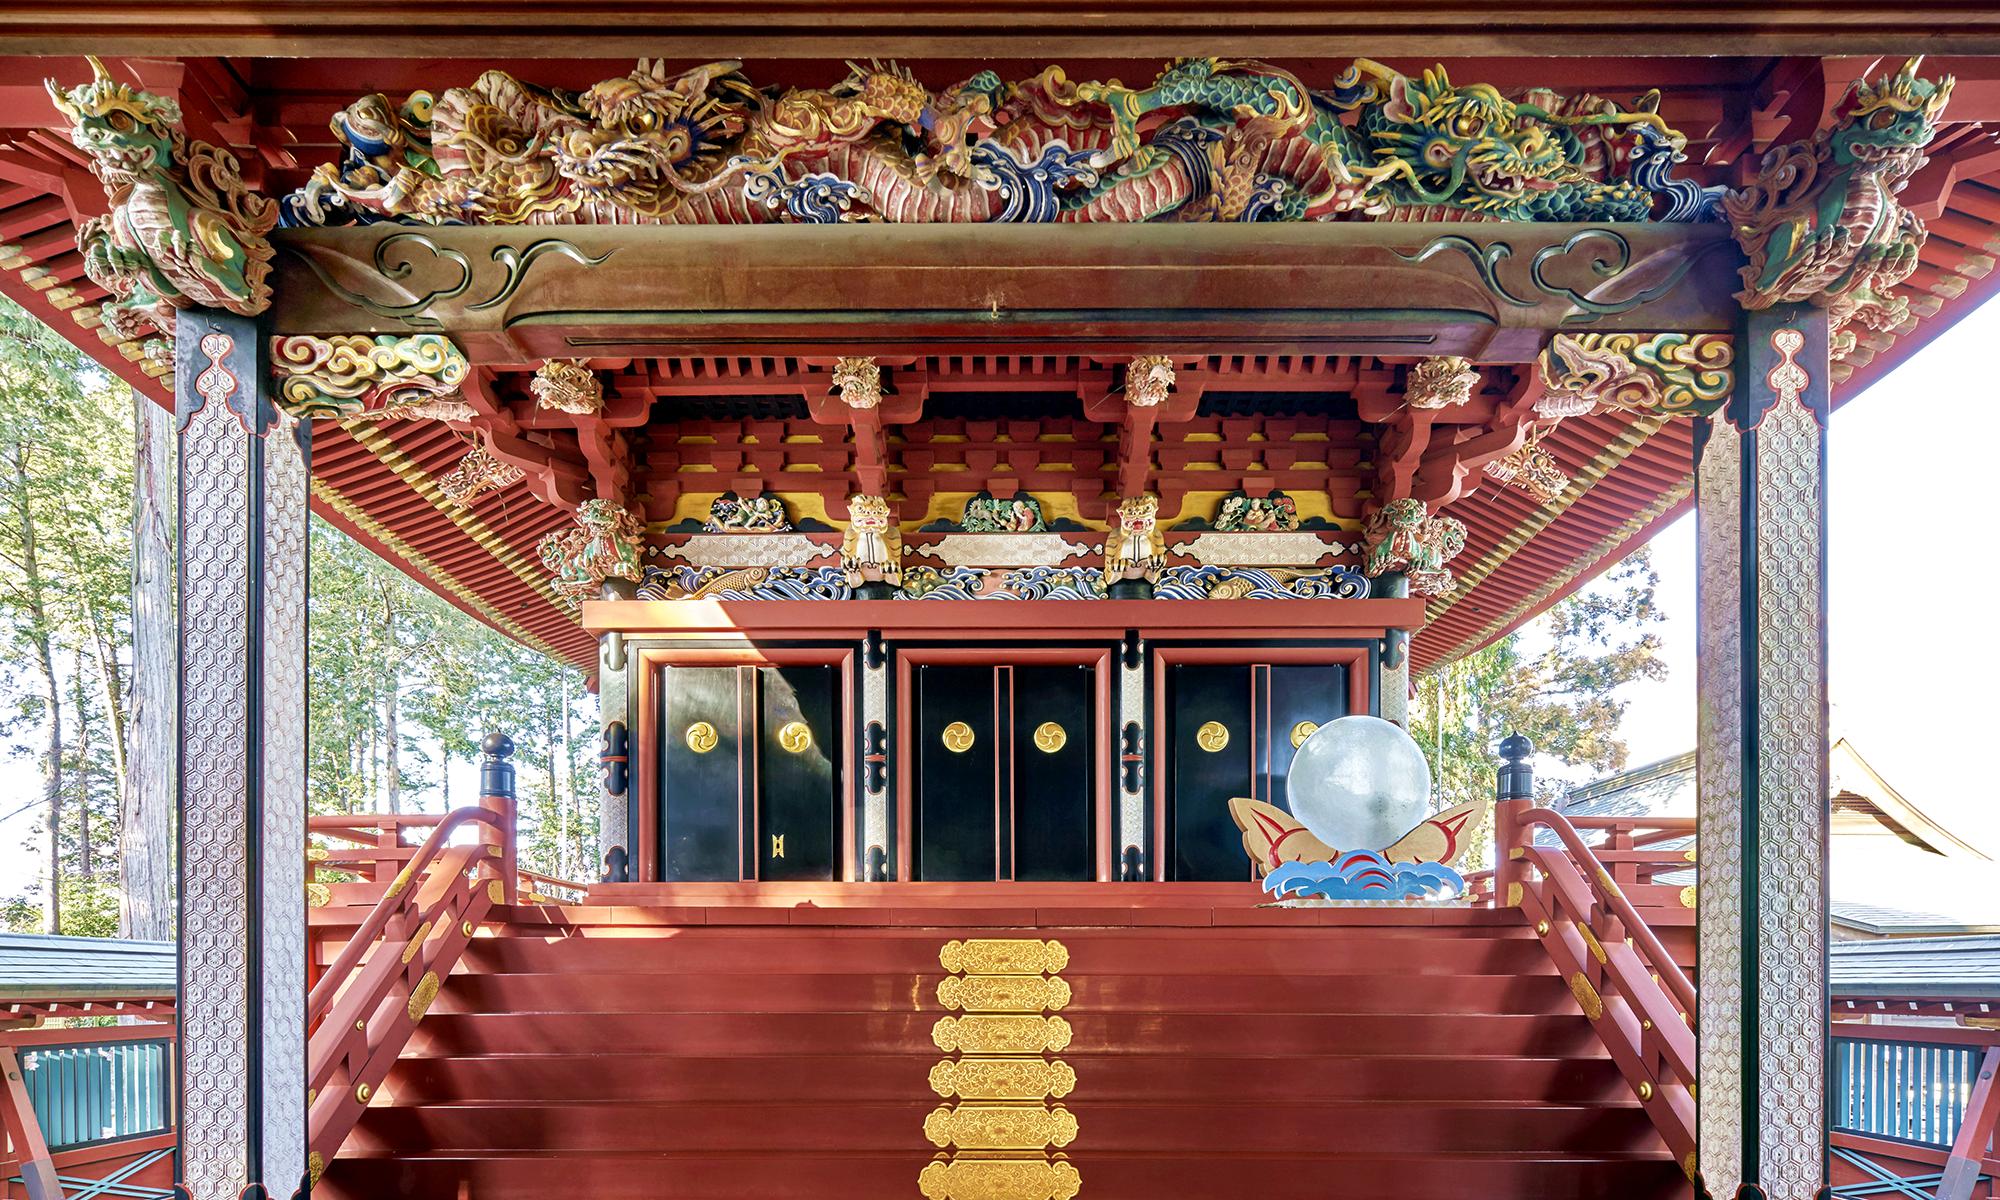 栃木県真岡市にある代表的な神社5社|鎮座地・御神徳(御利益)